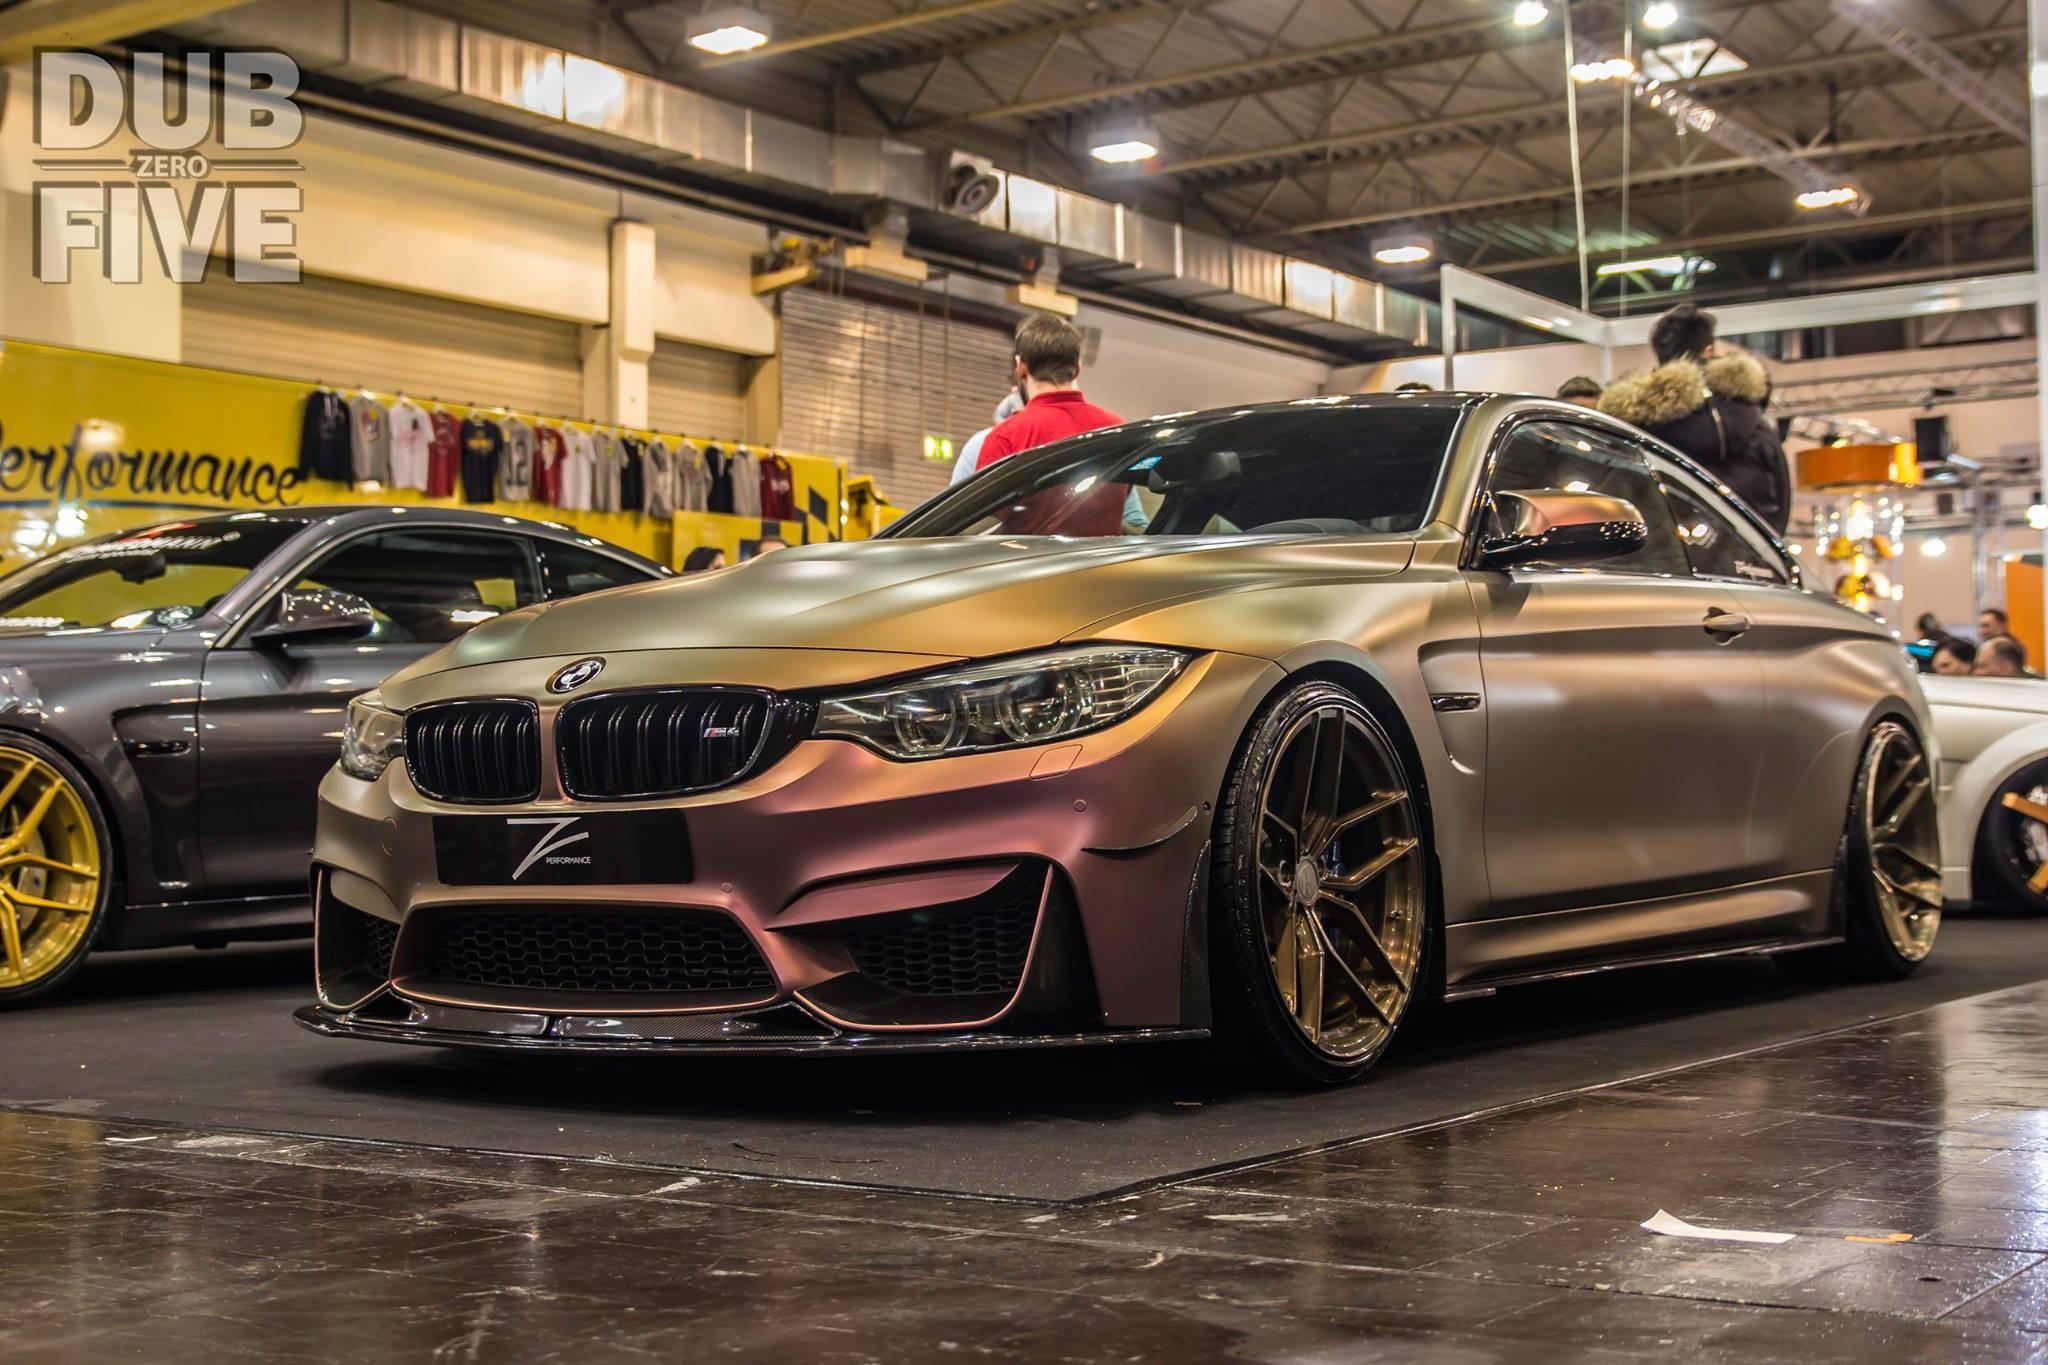 Essen Motor Show 2015 Highlights - GTspirit